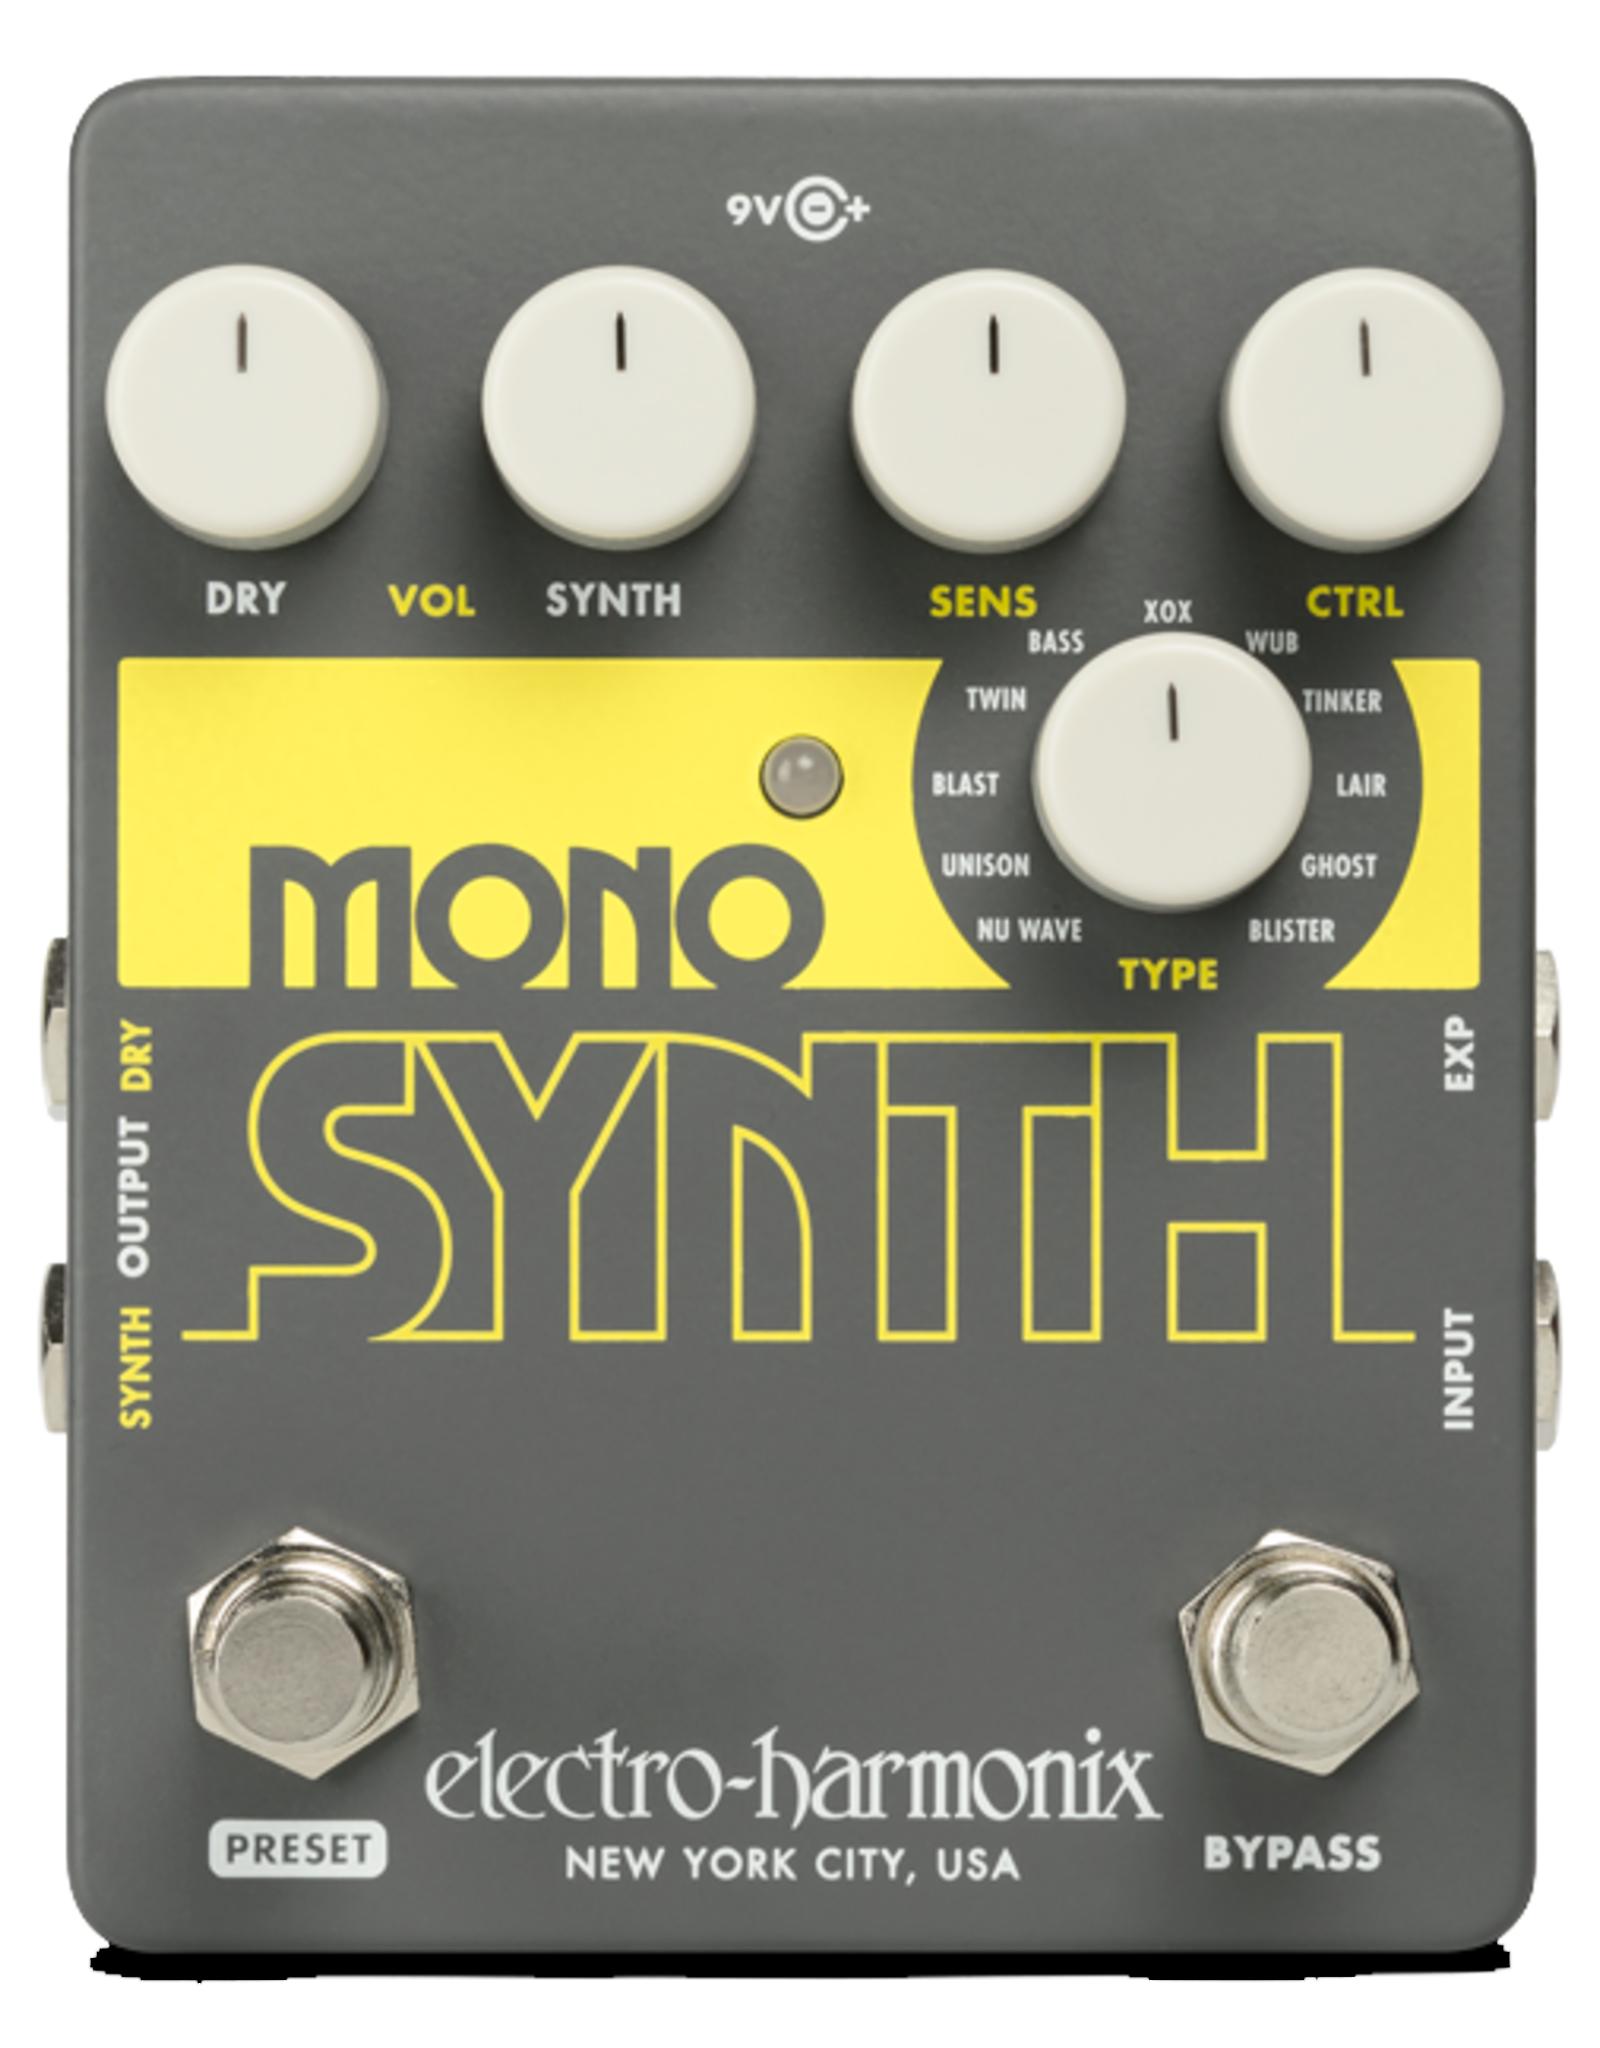 Electro-Harmonix EHX MONO SYNTH Guitar, 9.6DC-200 PSU Included